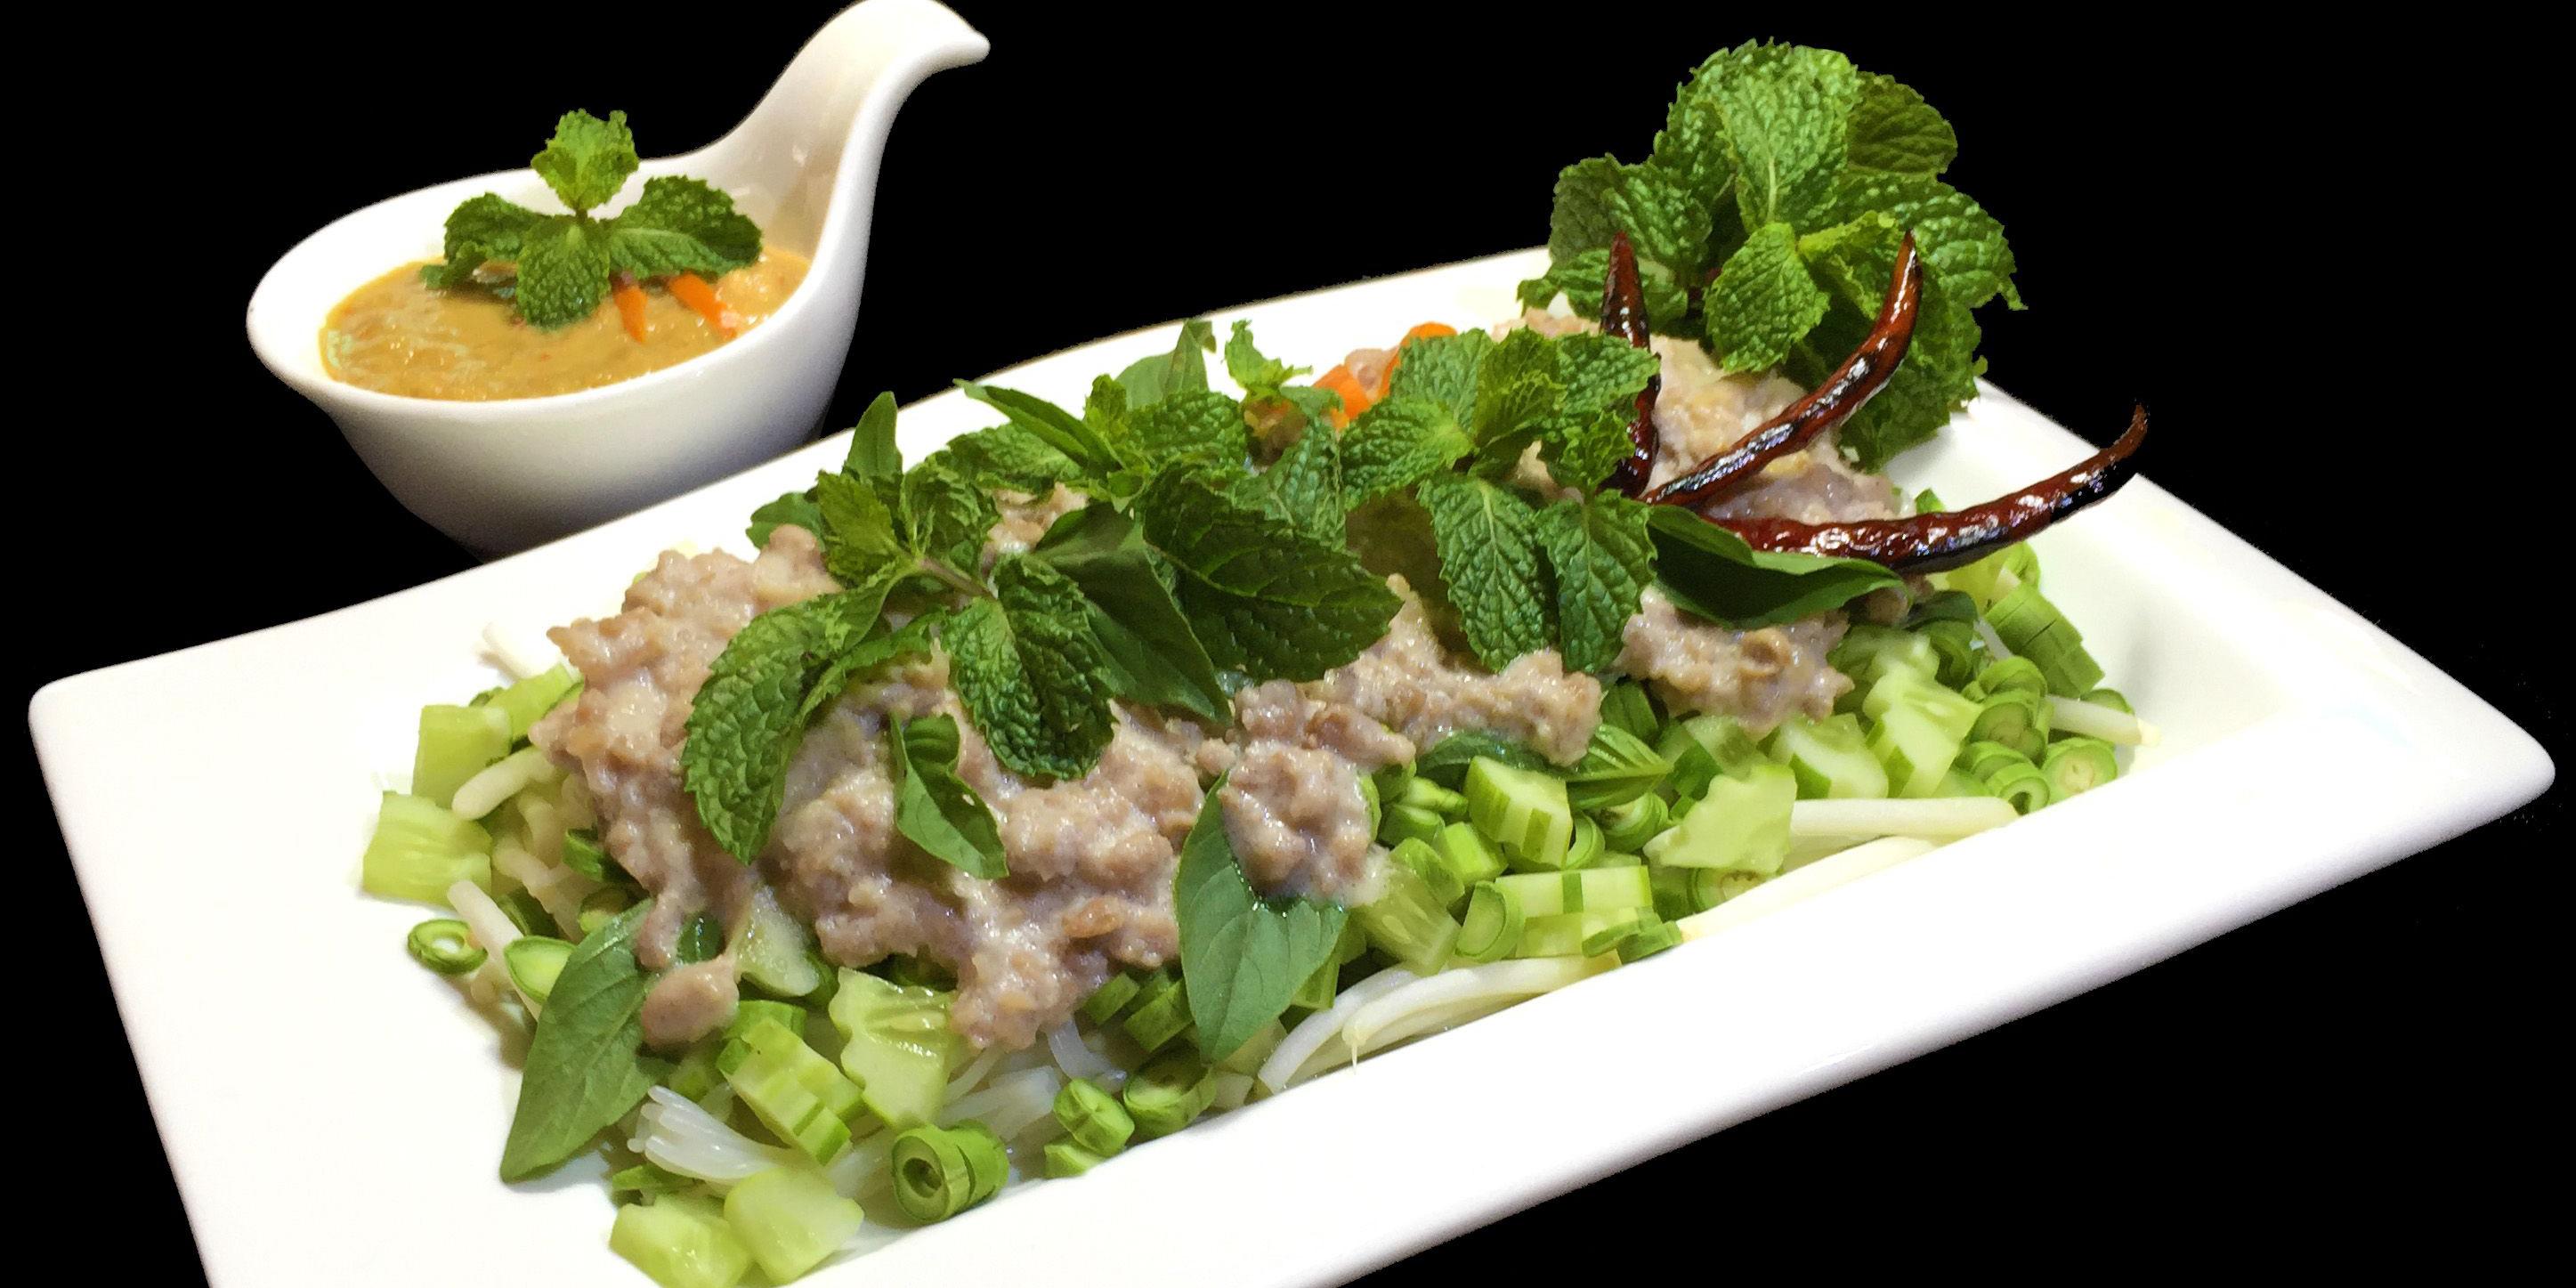 Dish 6 from The Witch Antiques & Restaurant at Muban Seri Villa Alley, Lane 2 Nong Bon, Prawet Bangkok Thailand